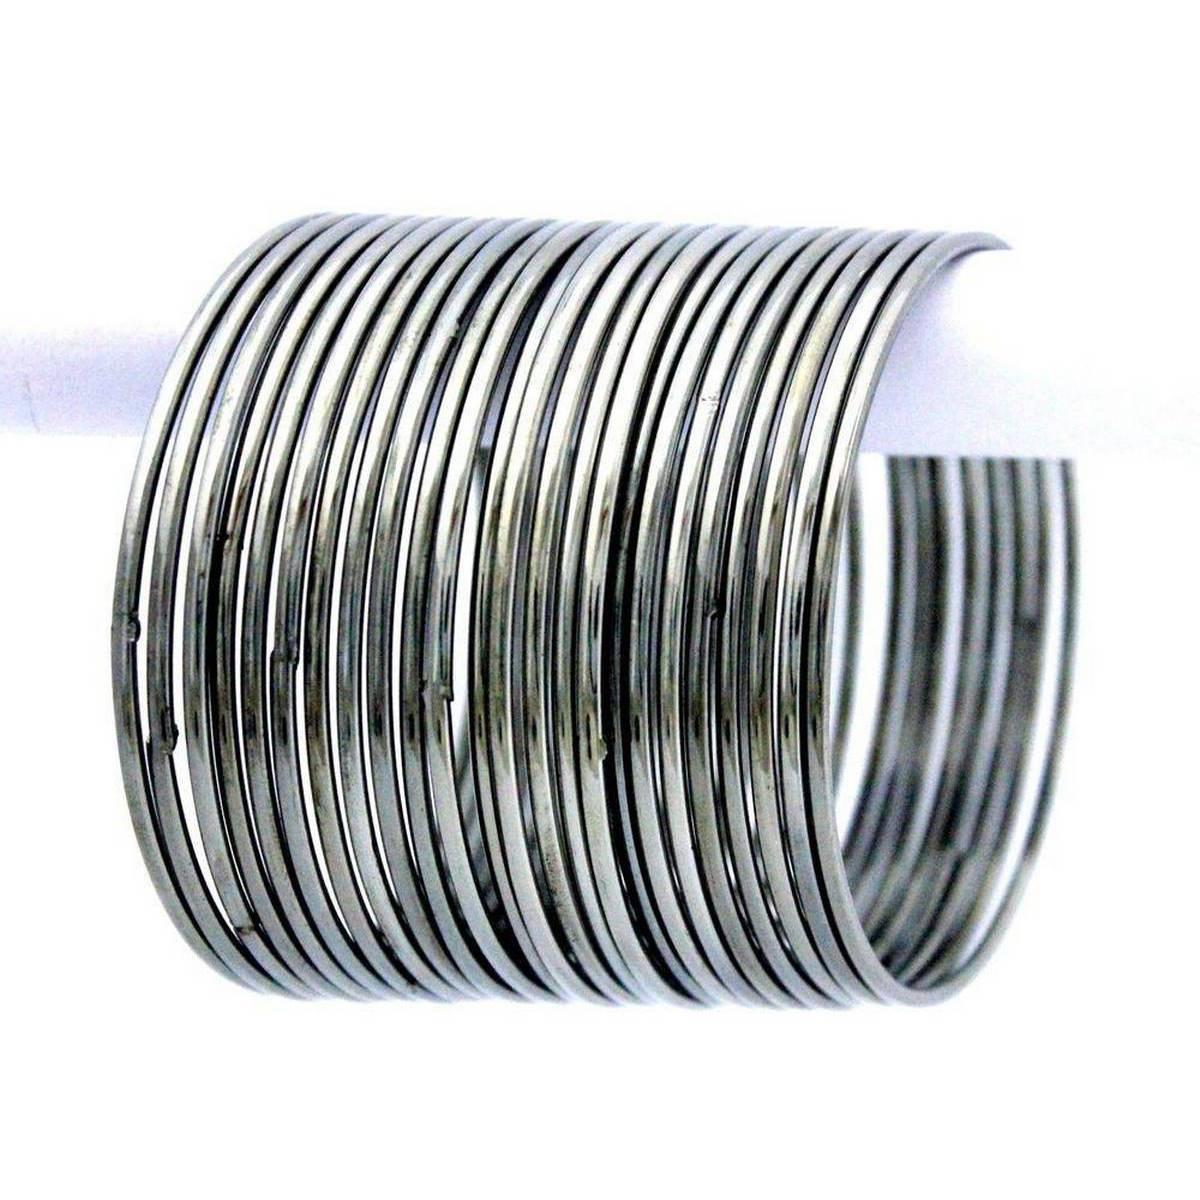 24 Piece Silver Metal Bangles